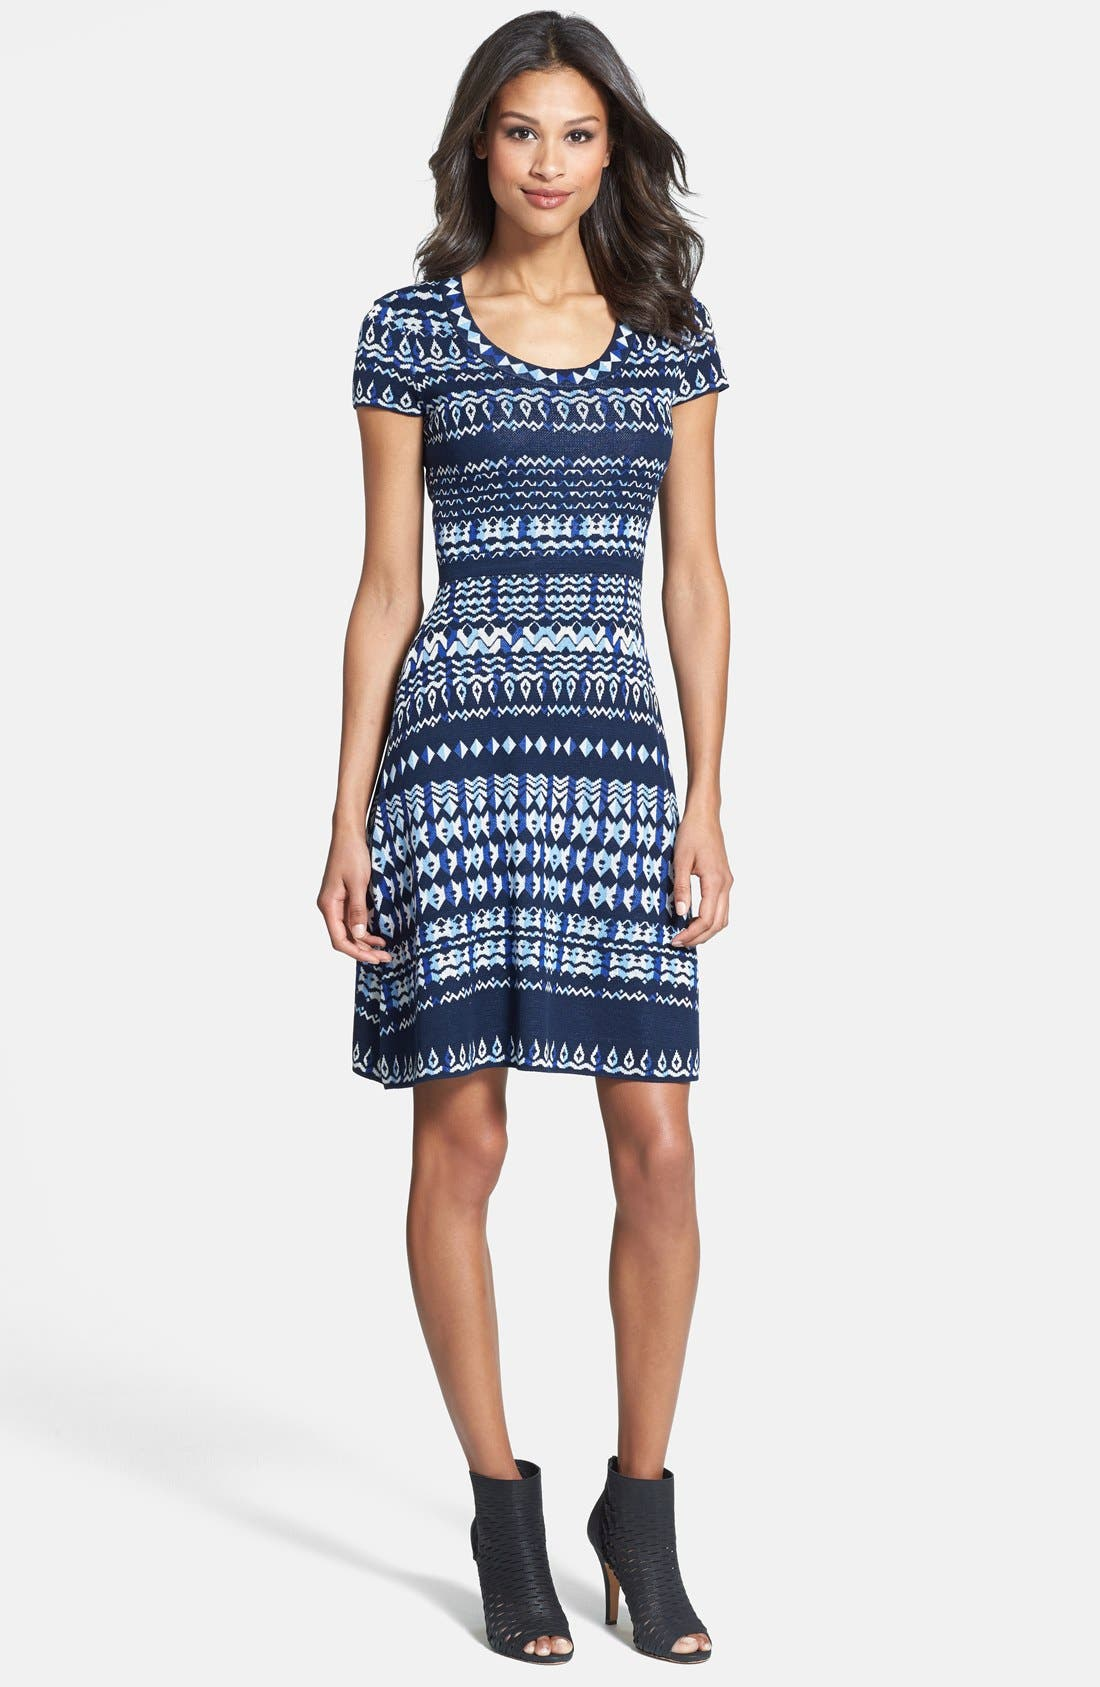 Alternate Image 1 Selected - BCBGMAXAZRIA Cap Sleeve Intarsia Knit Sweater Dress (Regular & Petite)